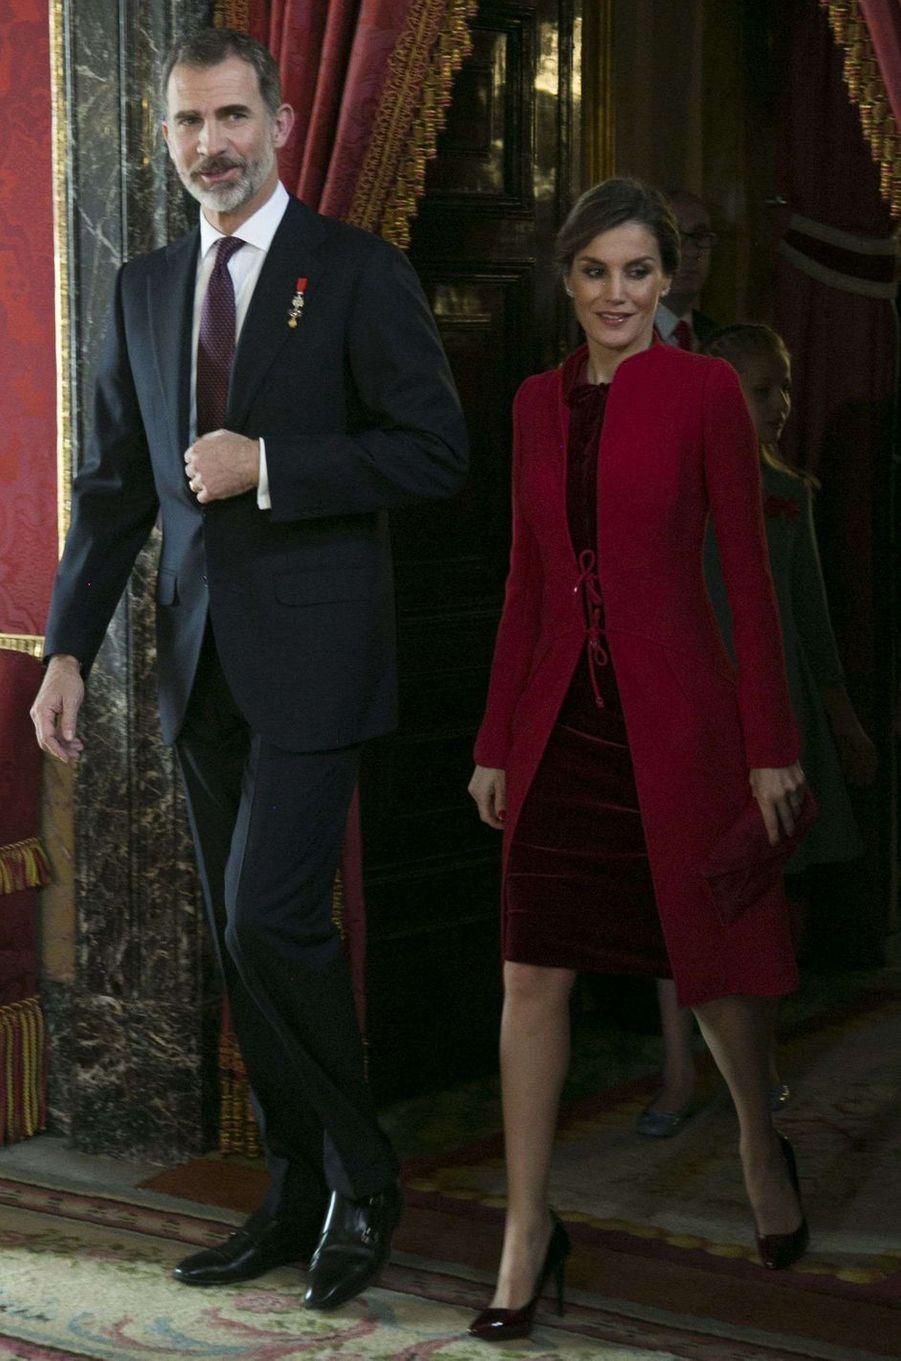 La reine Letizia d'Espagne en Felipe Varela, le 30 janvier 2018